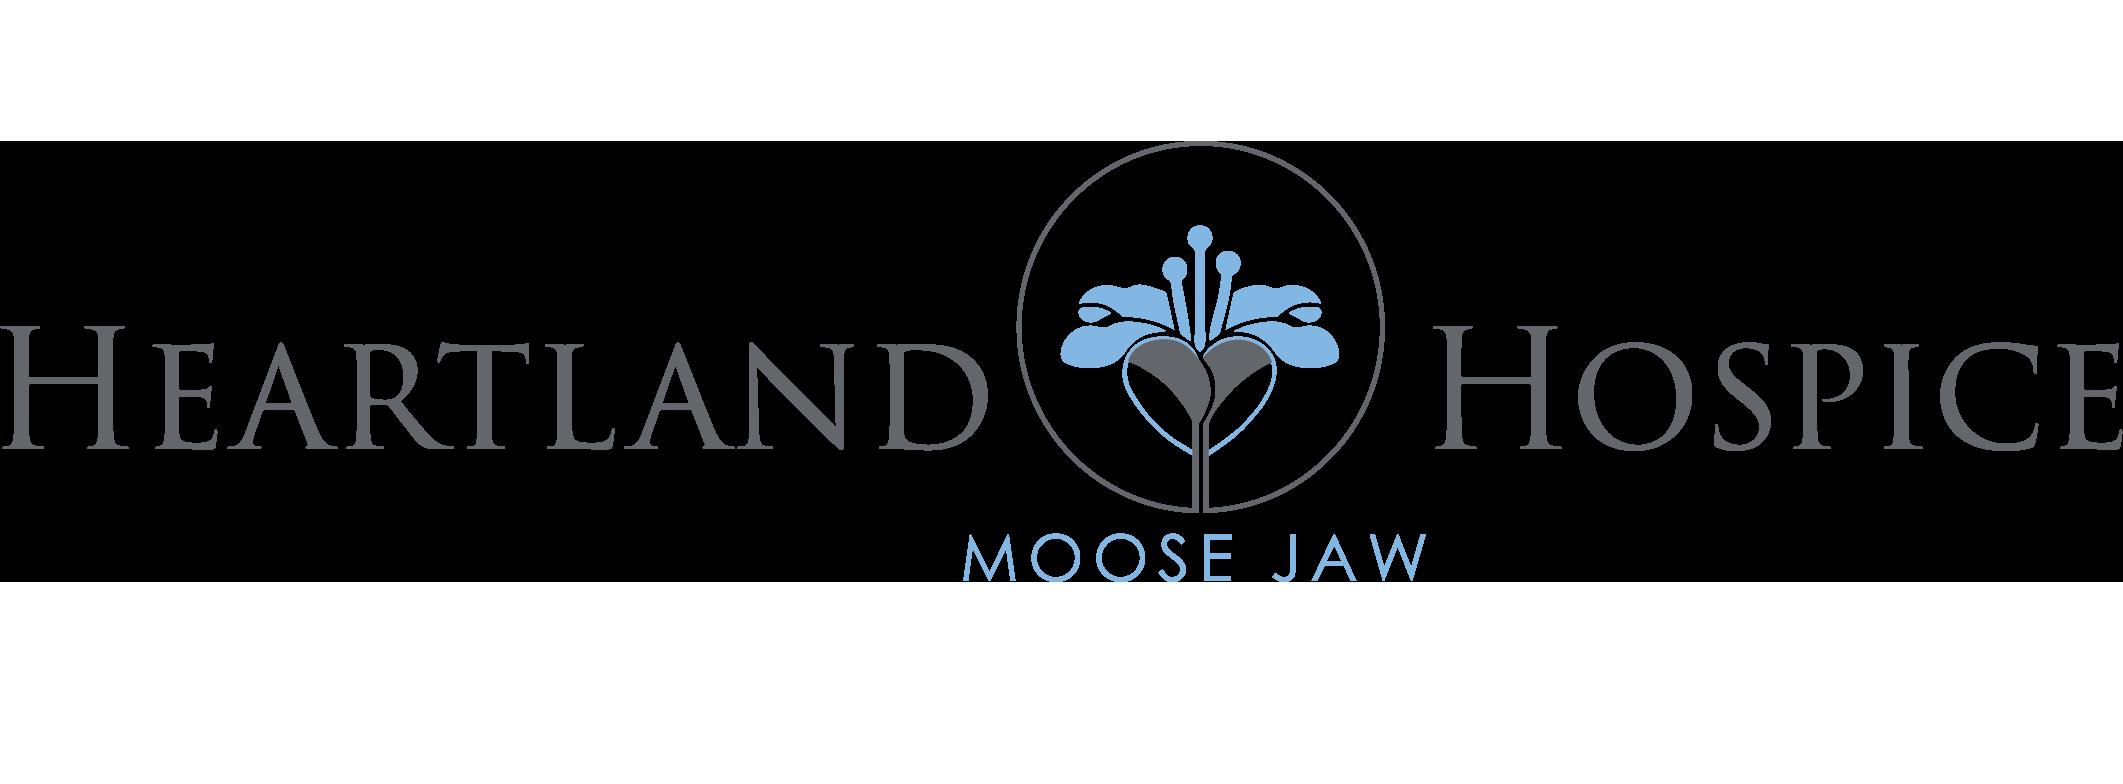 Heartland Hospice Moose Jaw